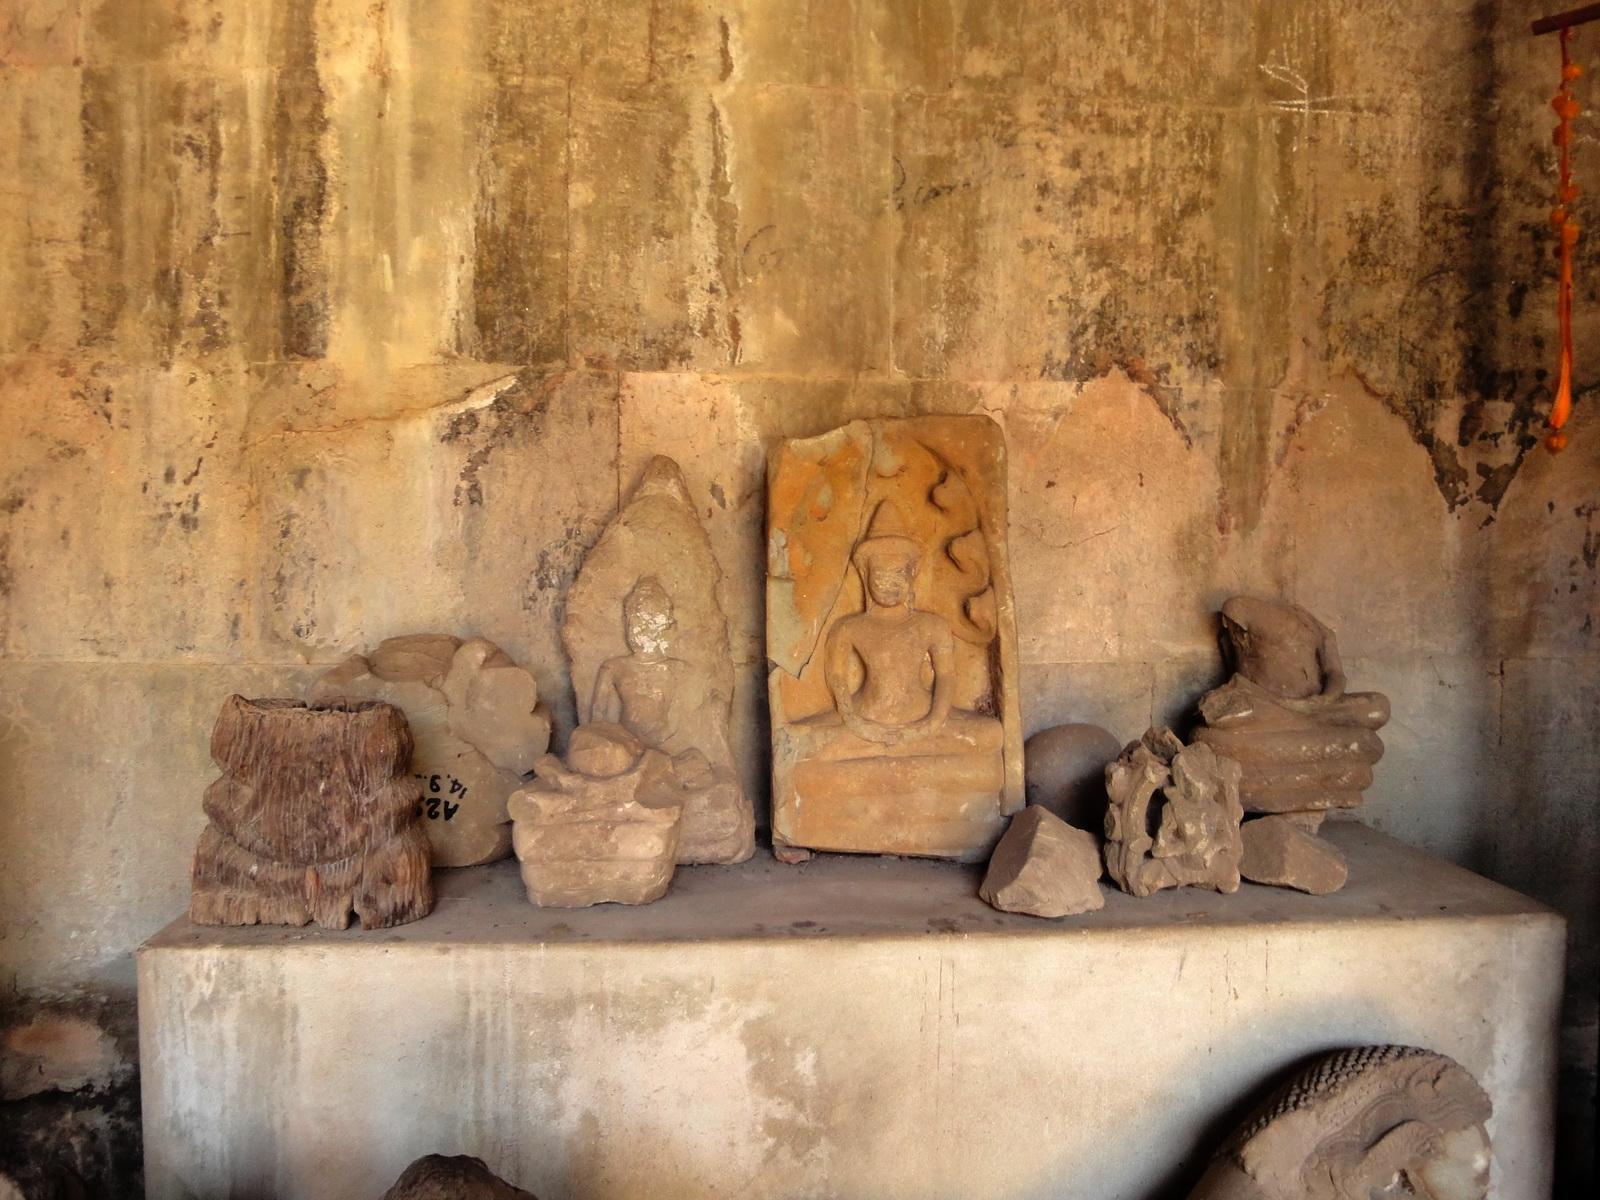 Angkor Wat inner sanctuary gallery Buddha relics 05